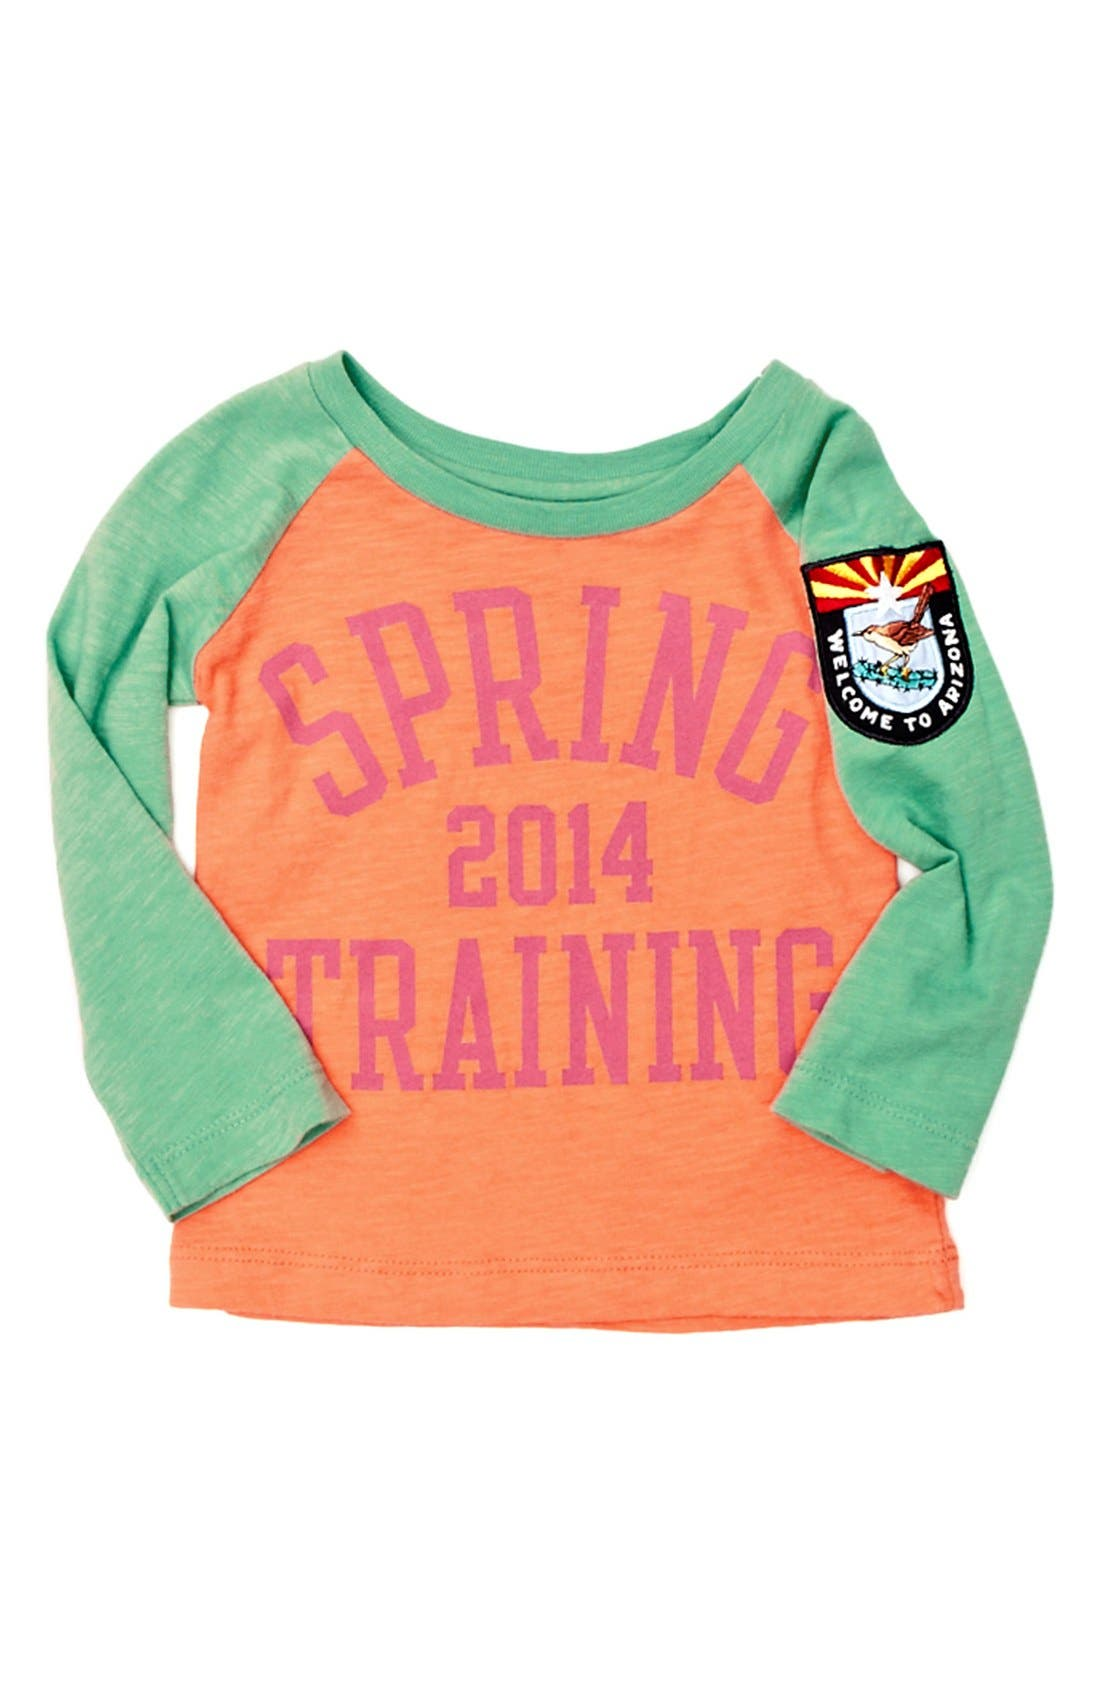 Alternate Image 1 Selected - Peek 'Spring Training' Tee (Baby Girls)